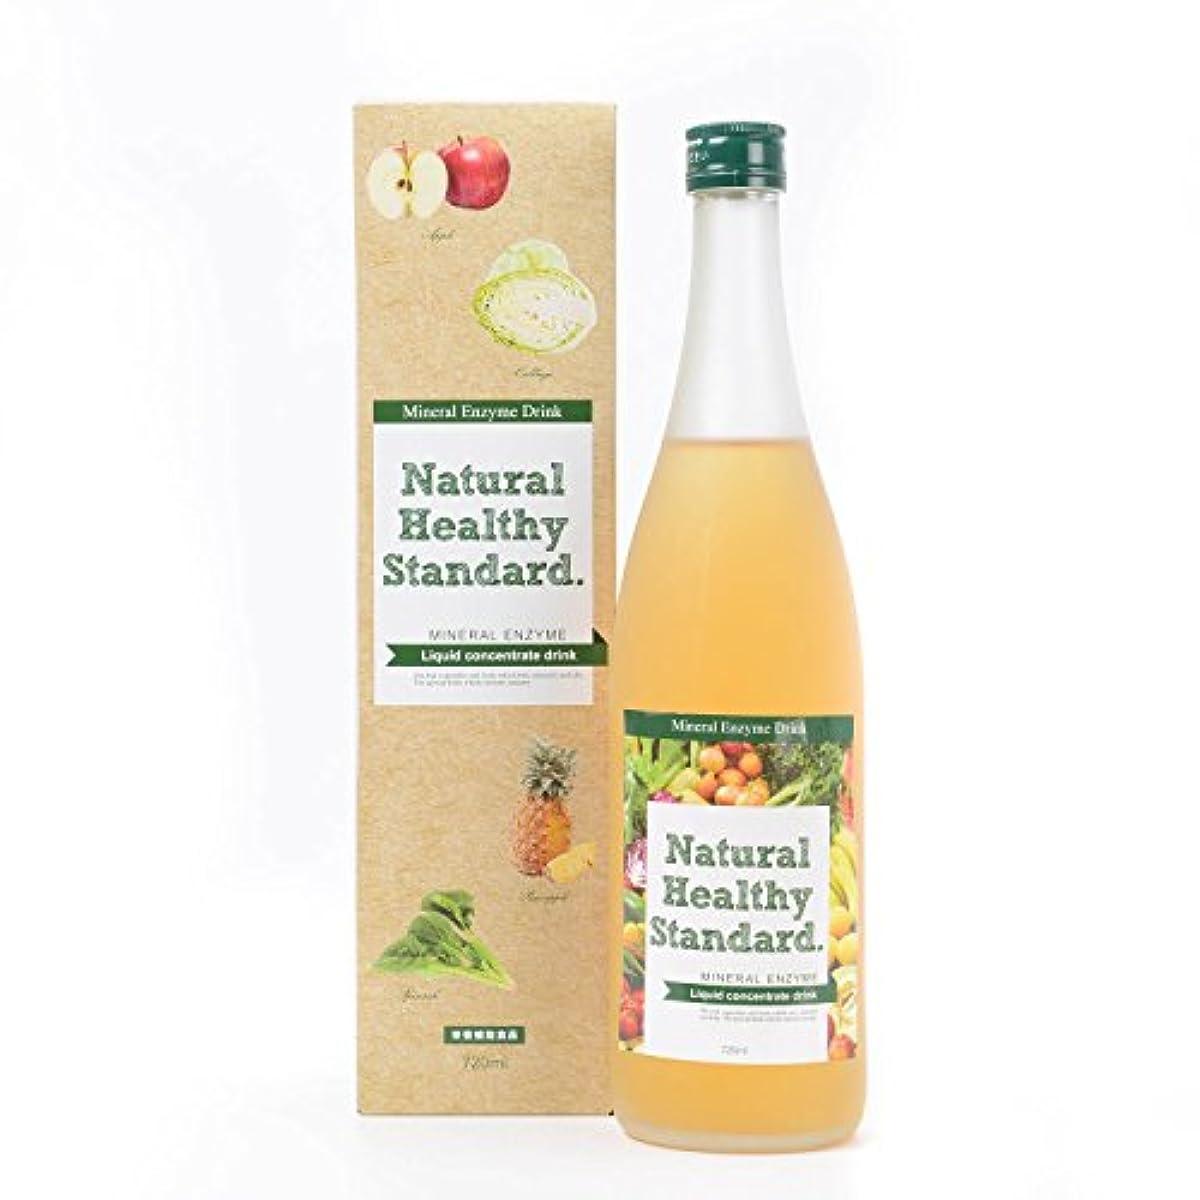 Natural Healthy Standard 스탄다드미네랄 효소 드링크 사과 맛